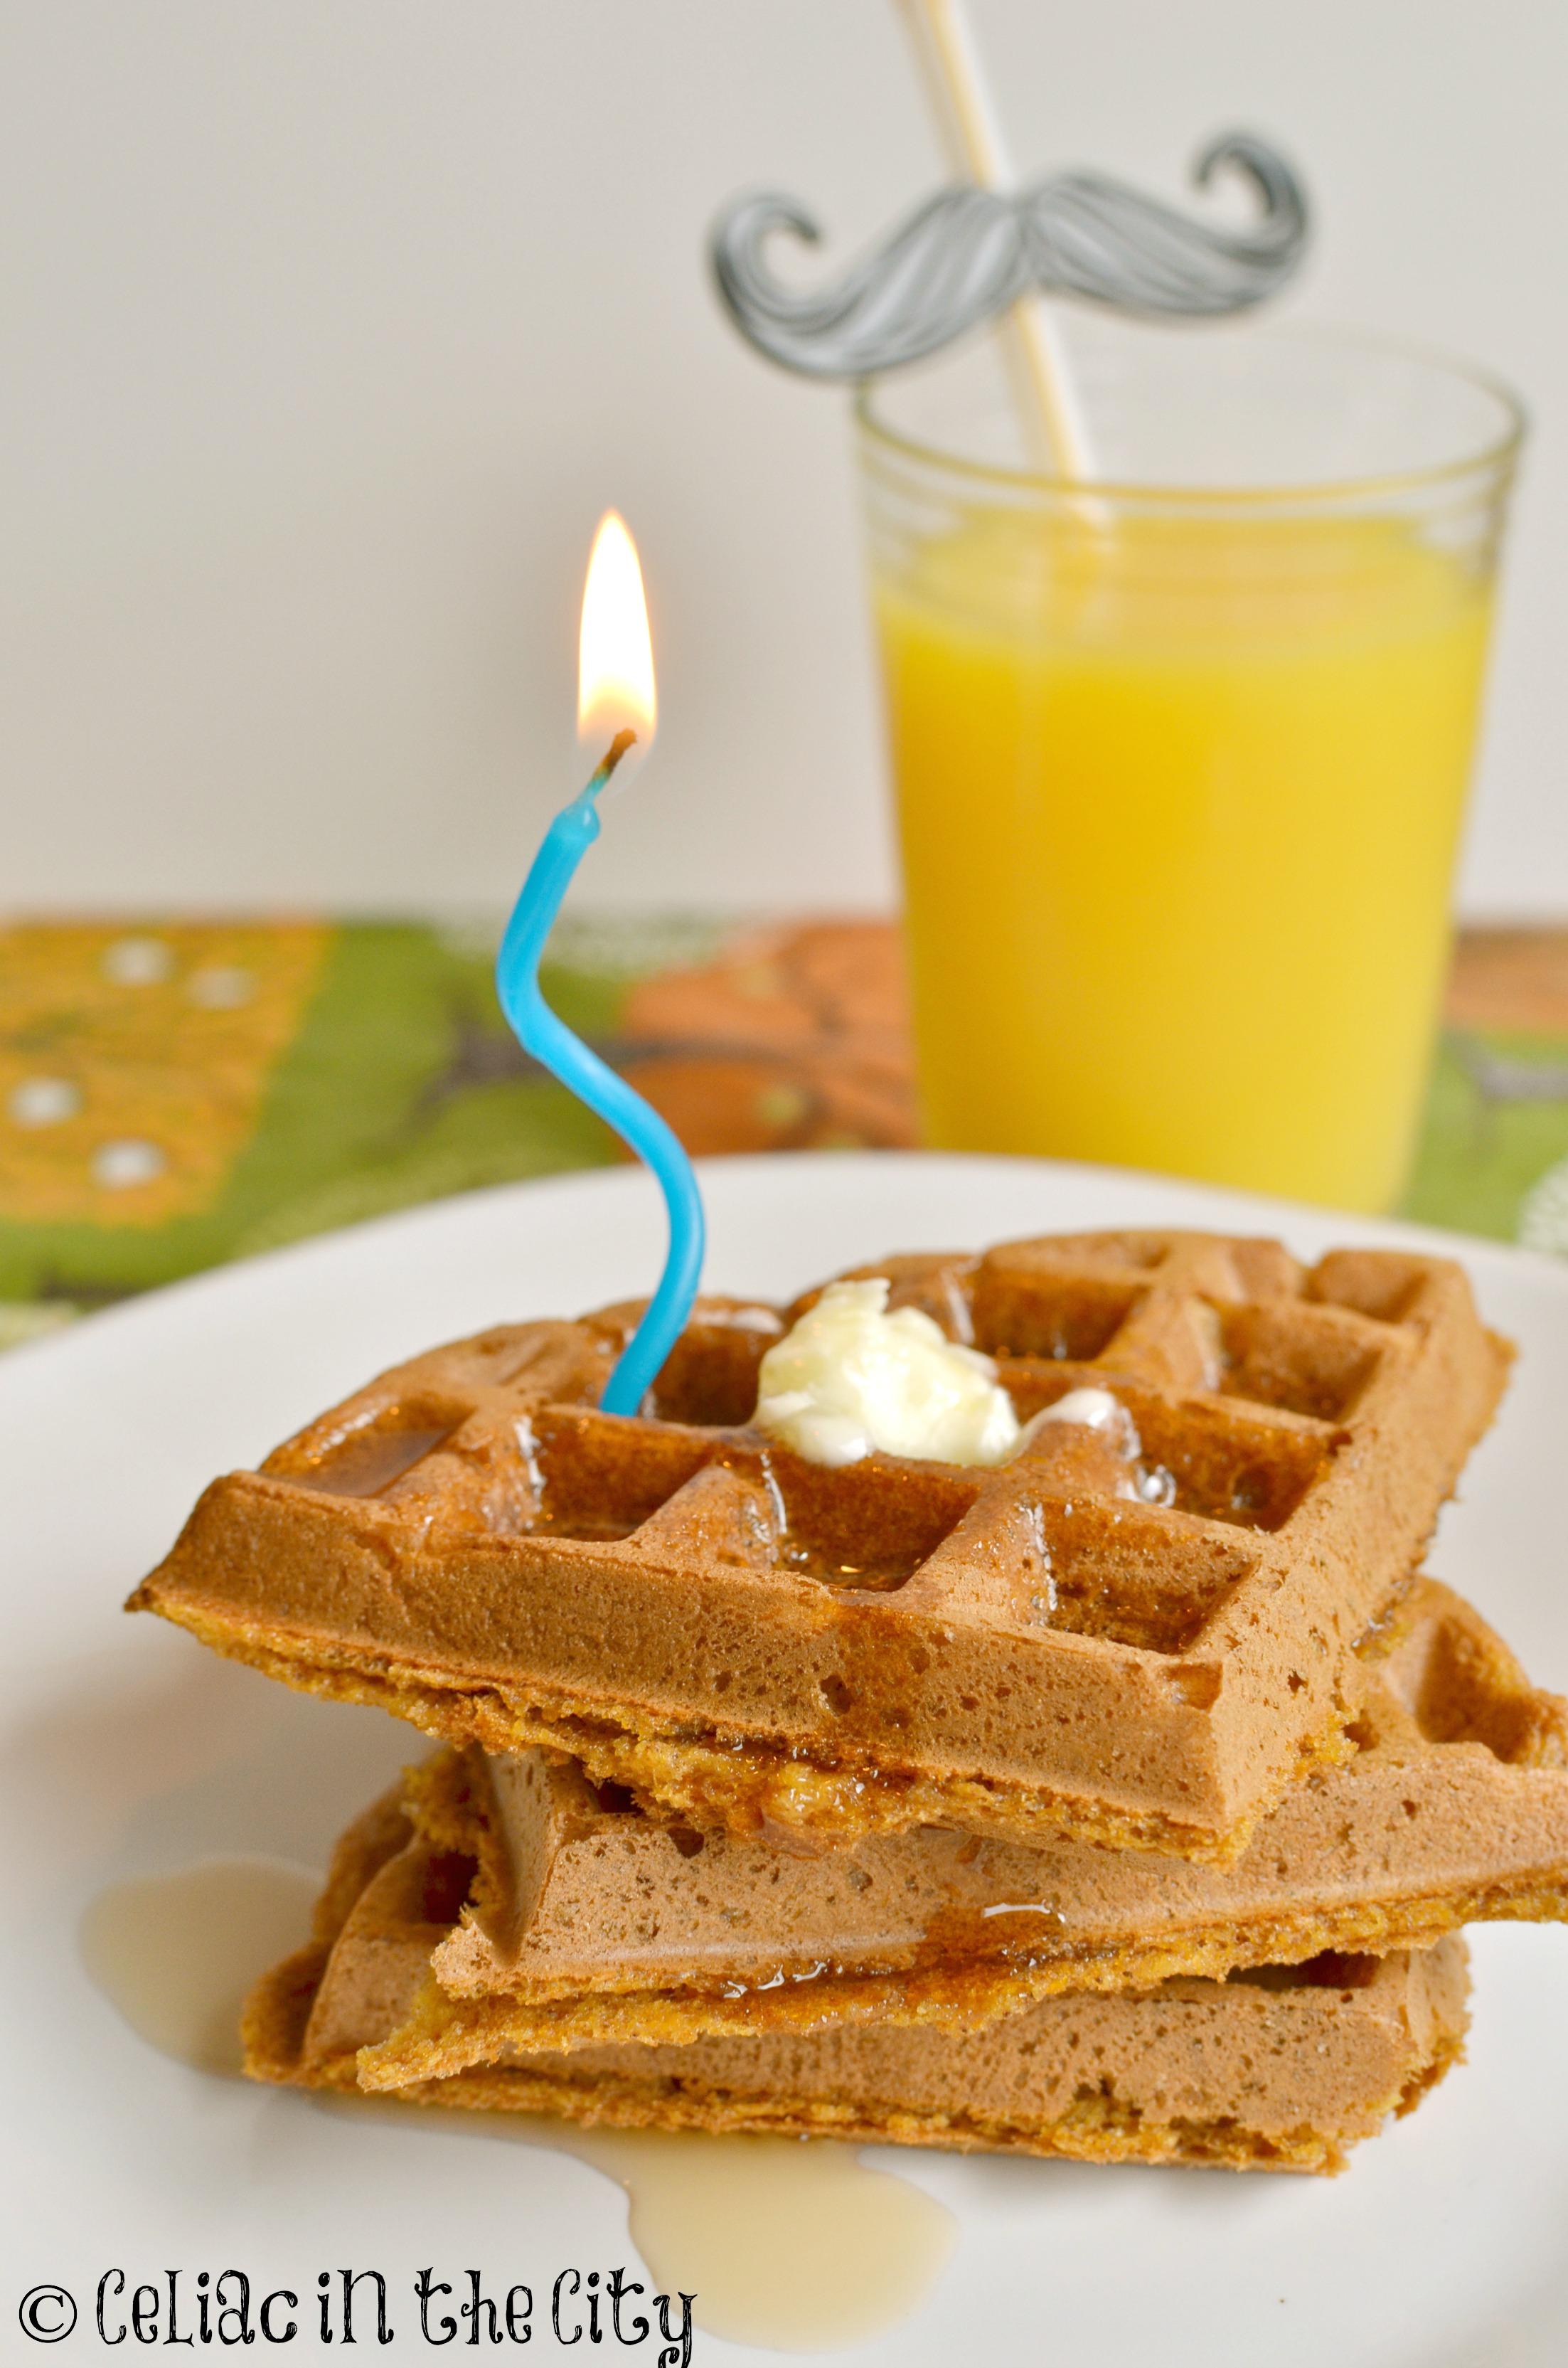 gluten free waffle recipe   Celiac in the City